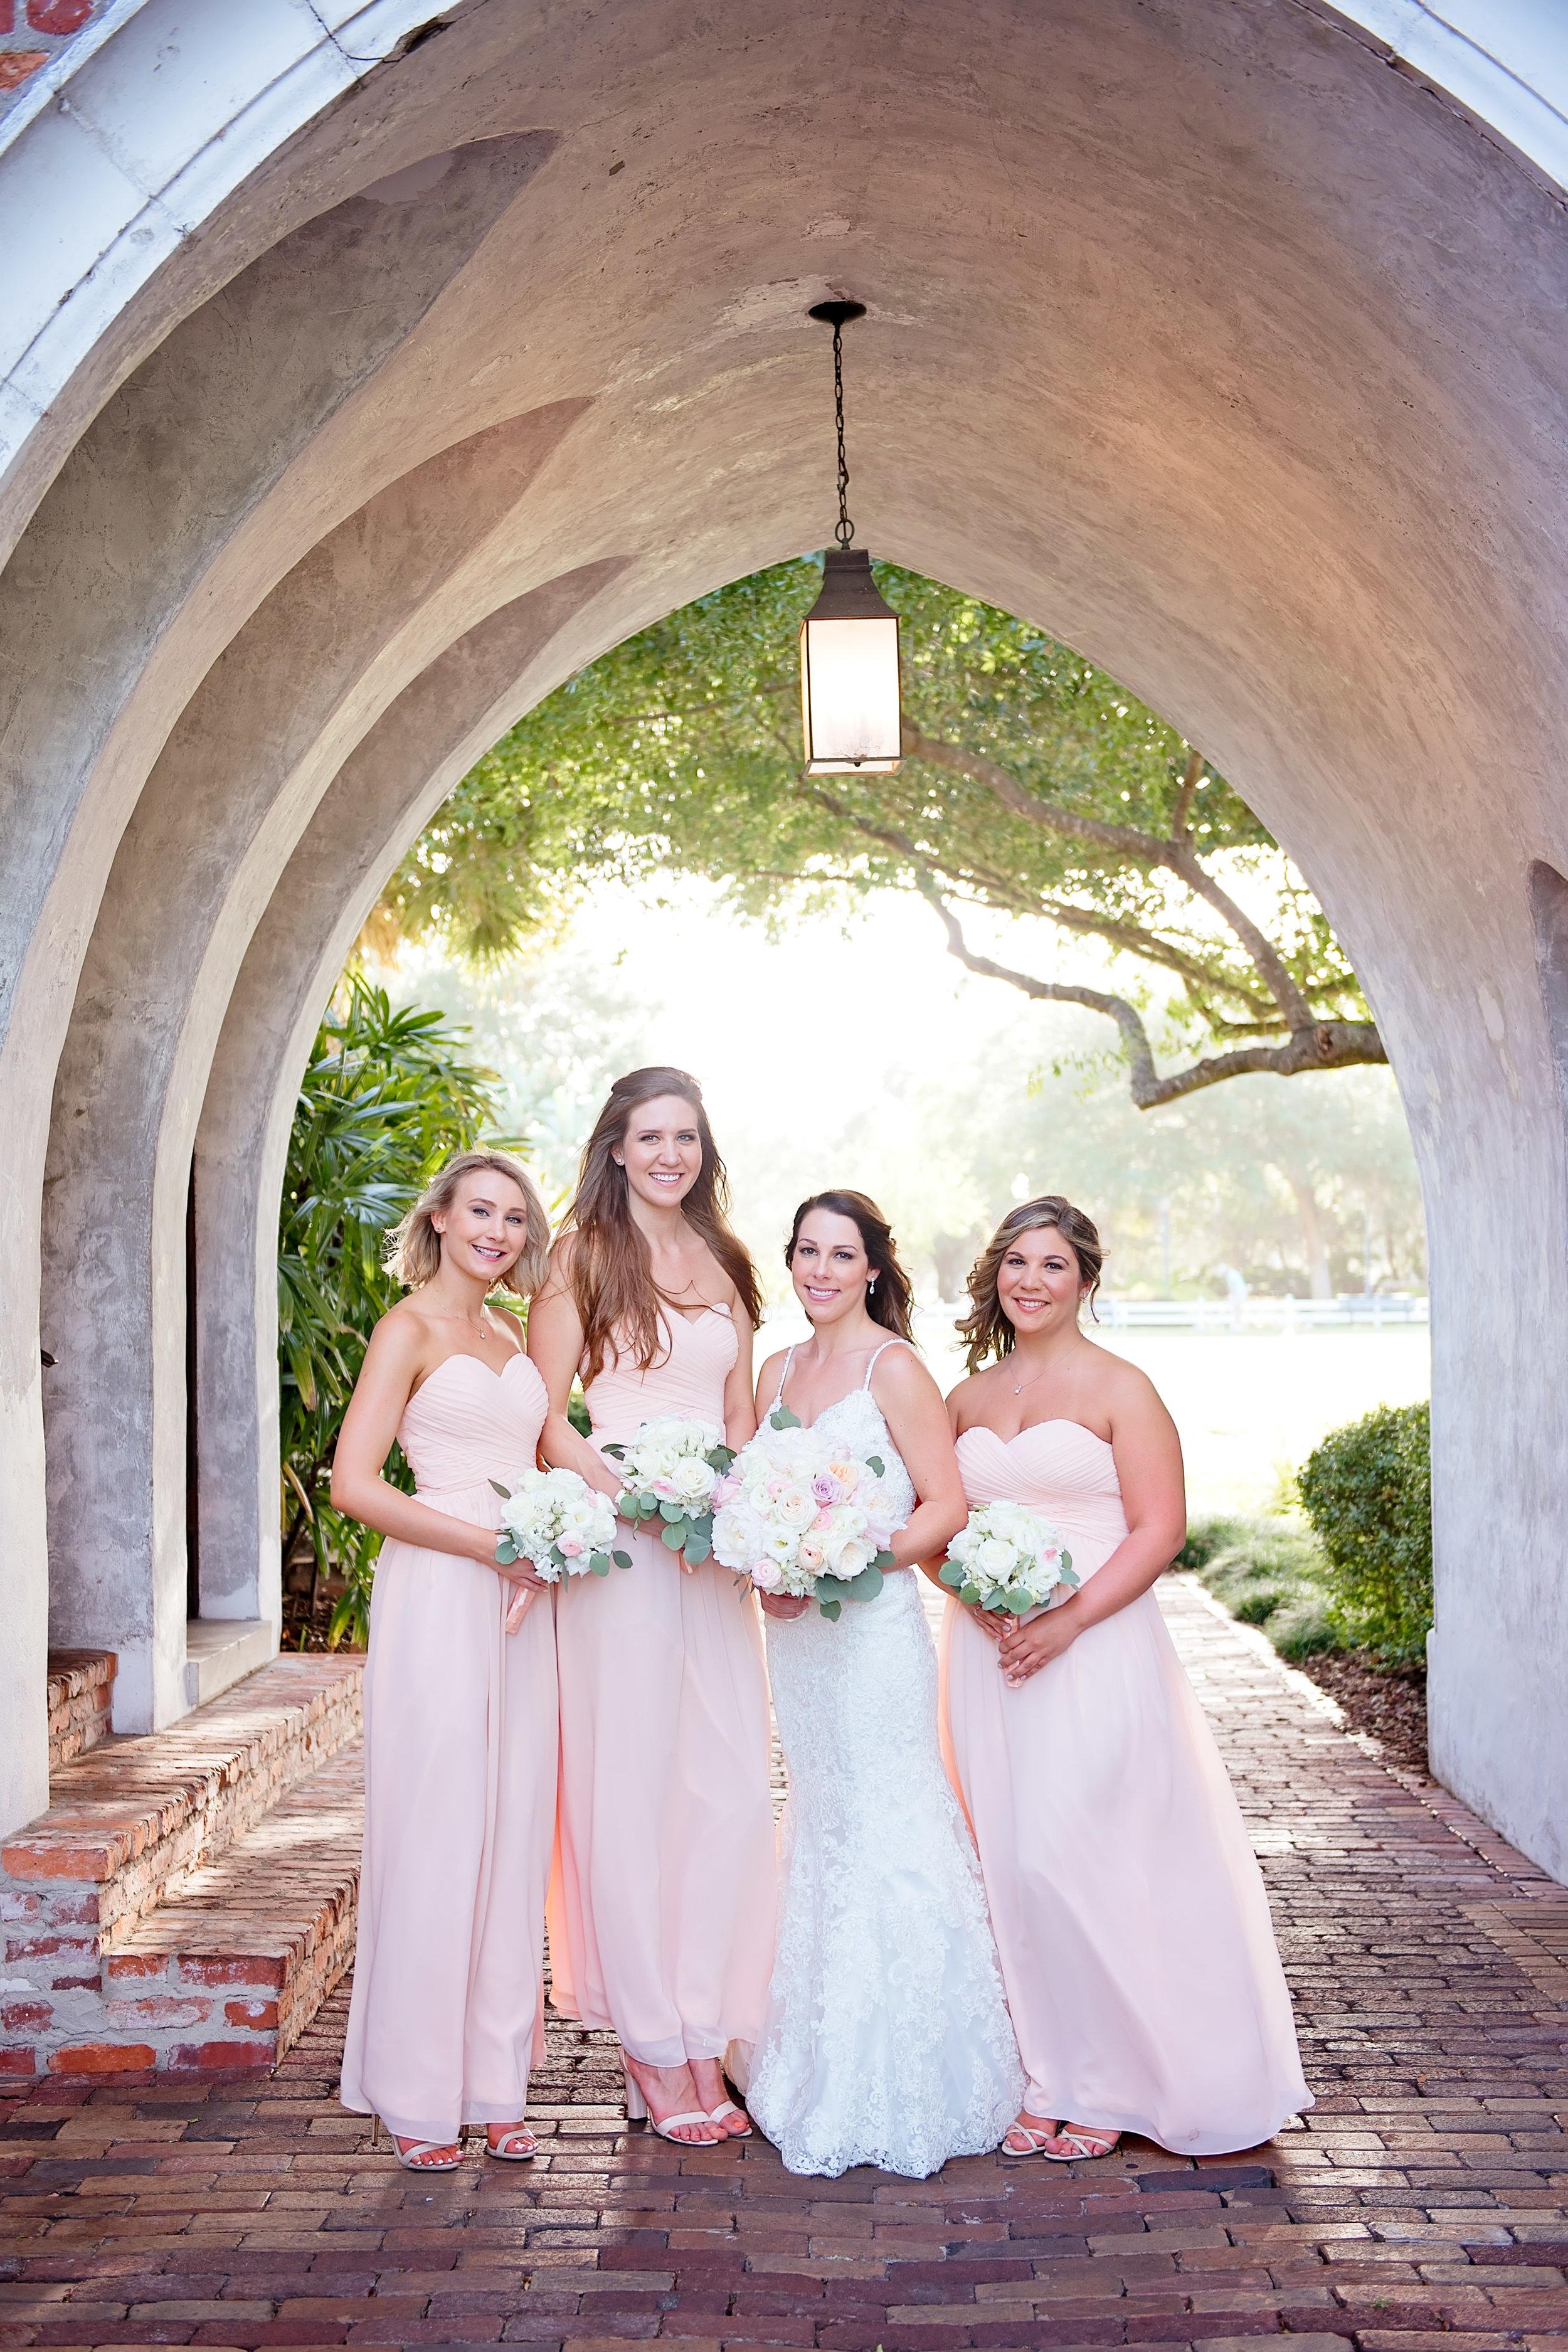 Bush Bridesmaid Dress - Blush and White Wedding - Los Feliz Wedding